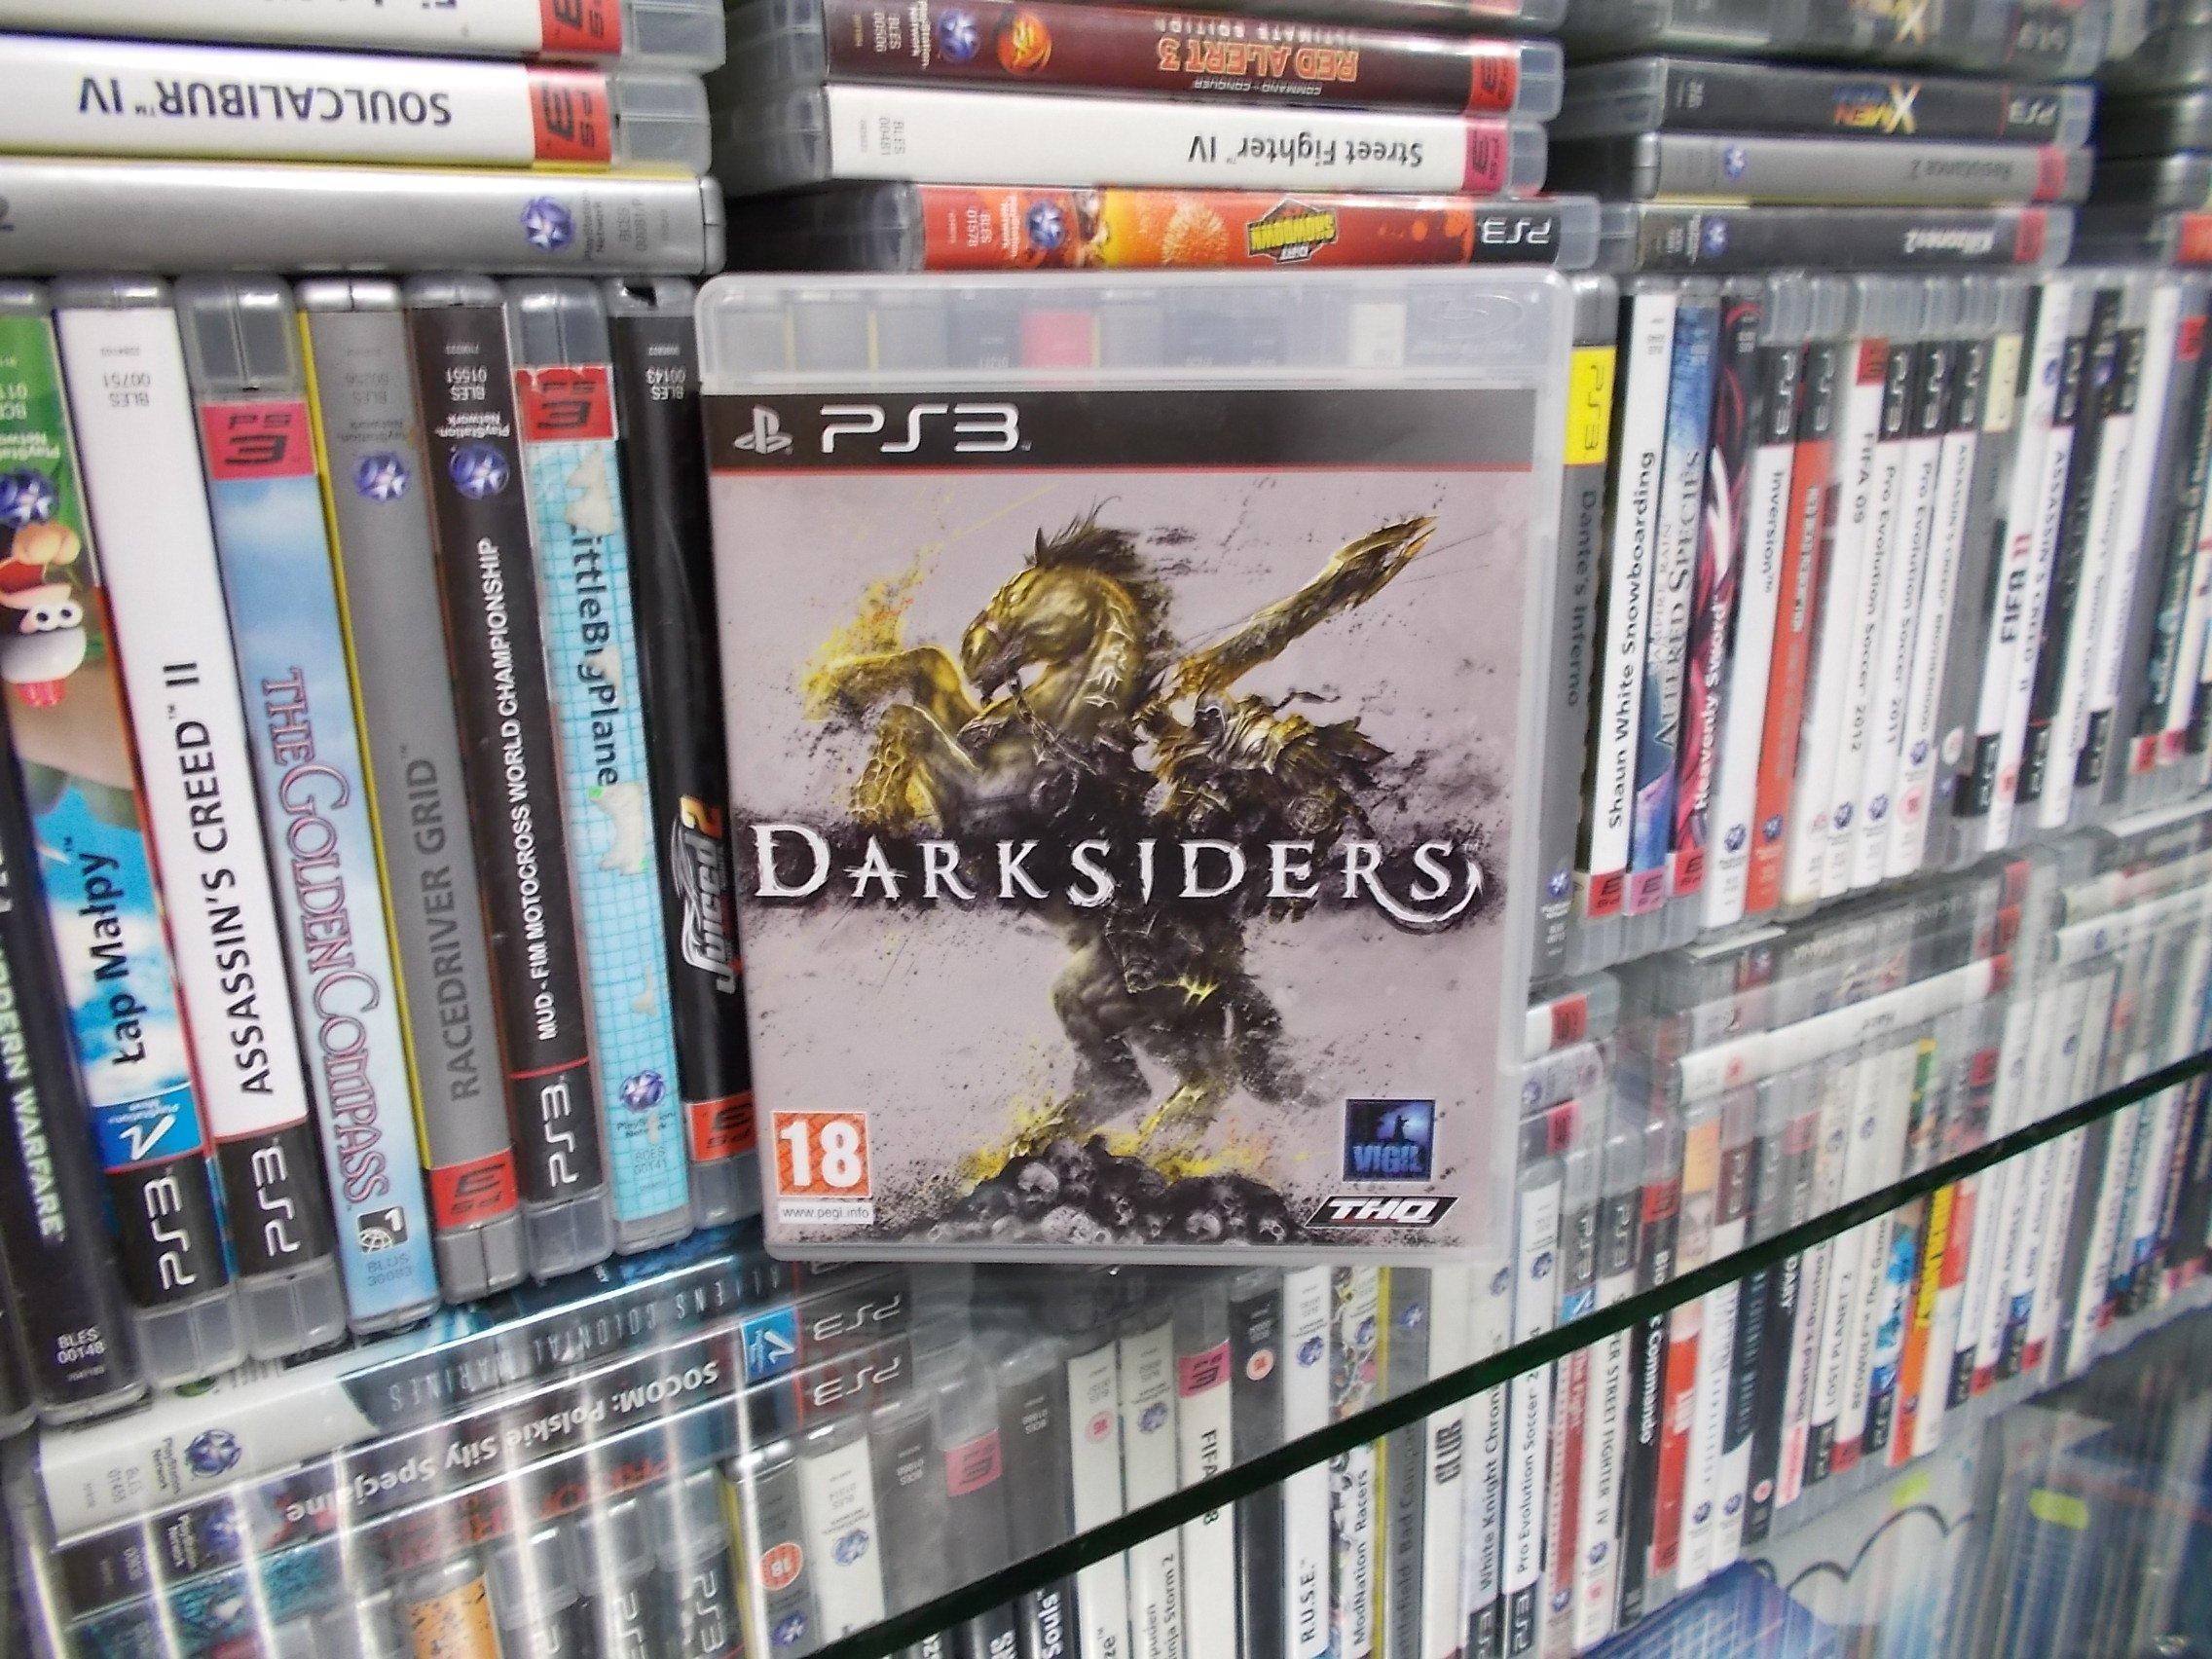 Darksiders - GRA PS3 - Opole 0016